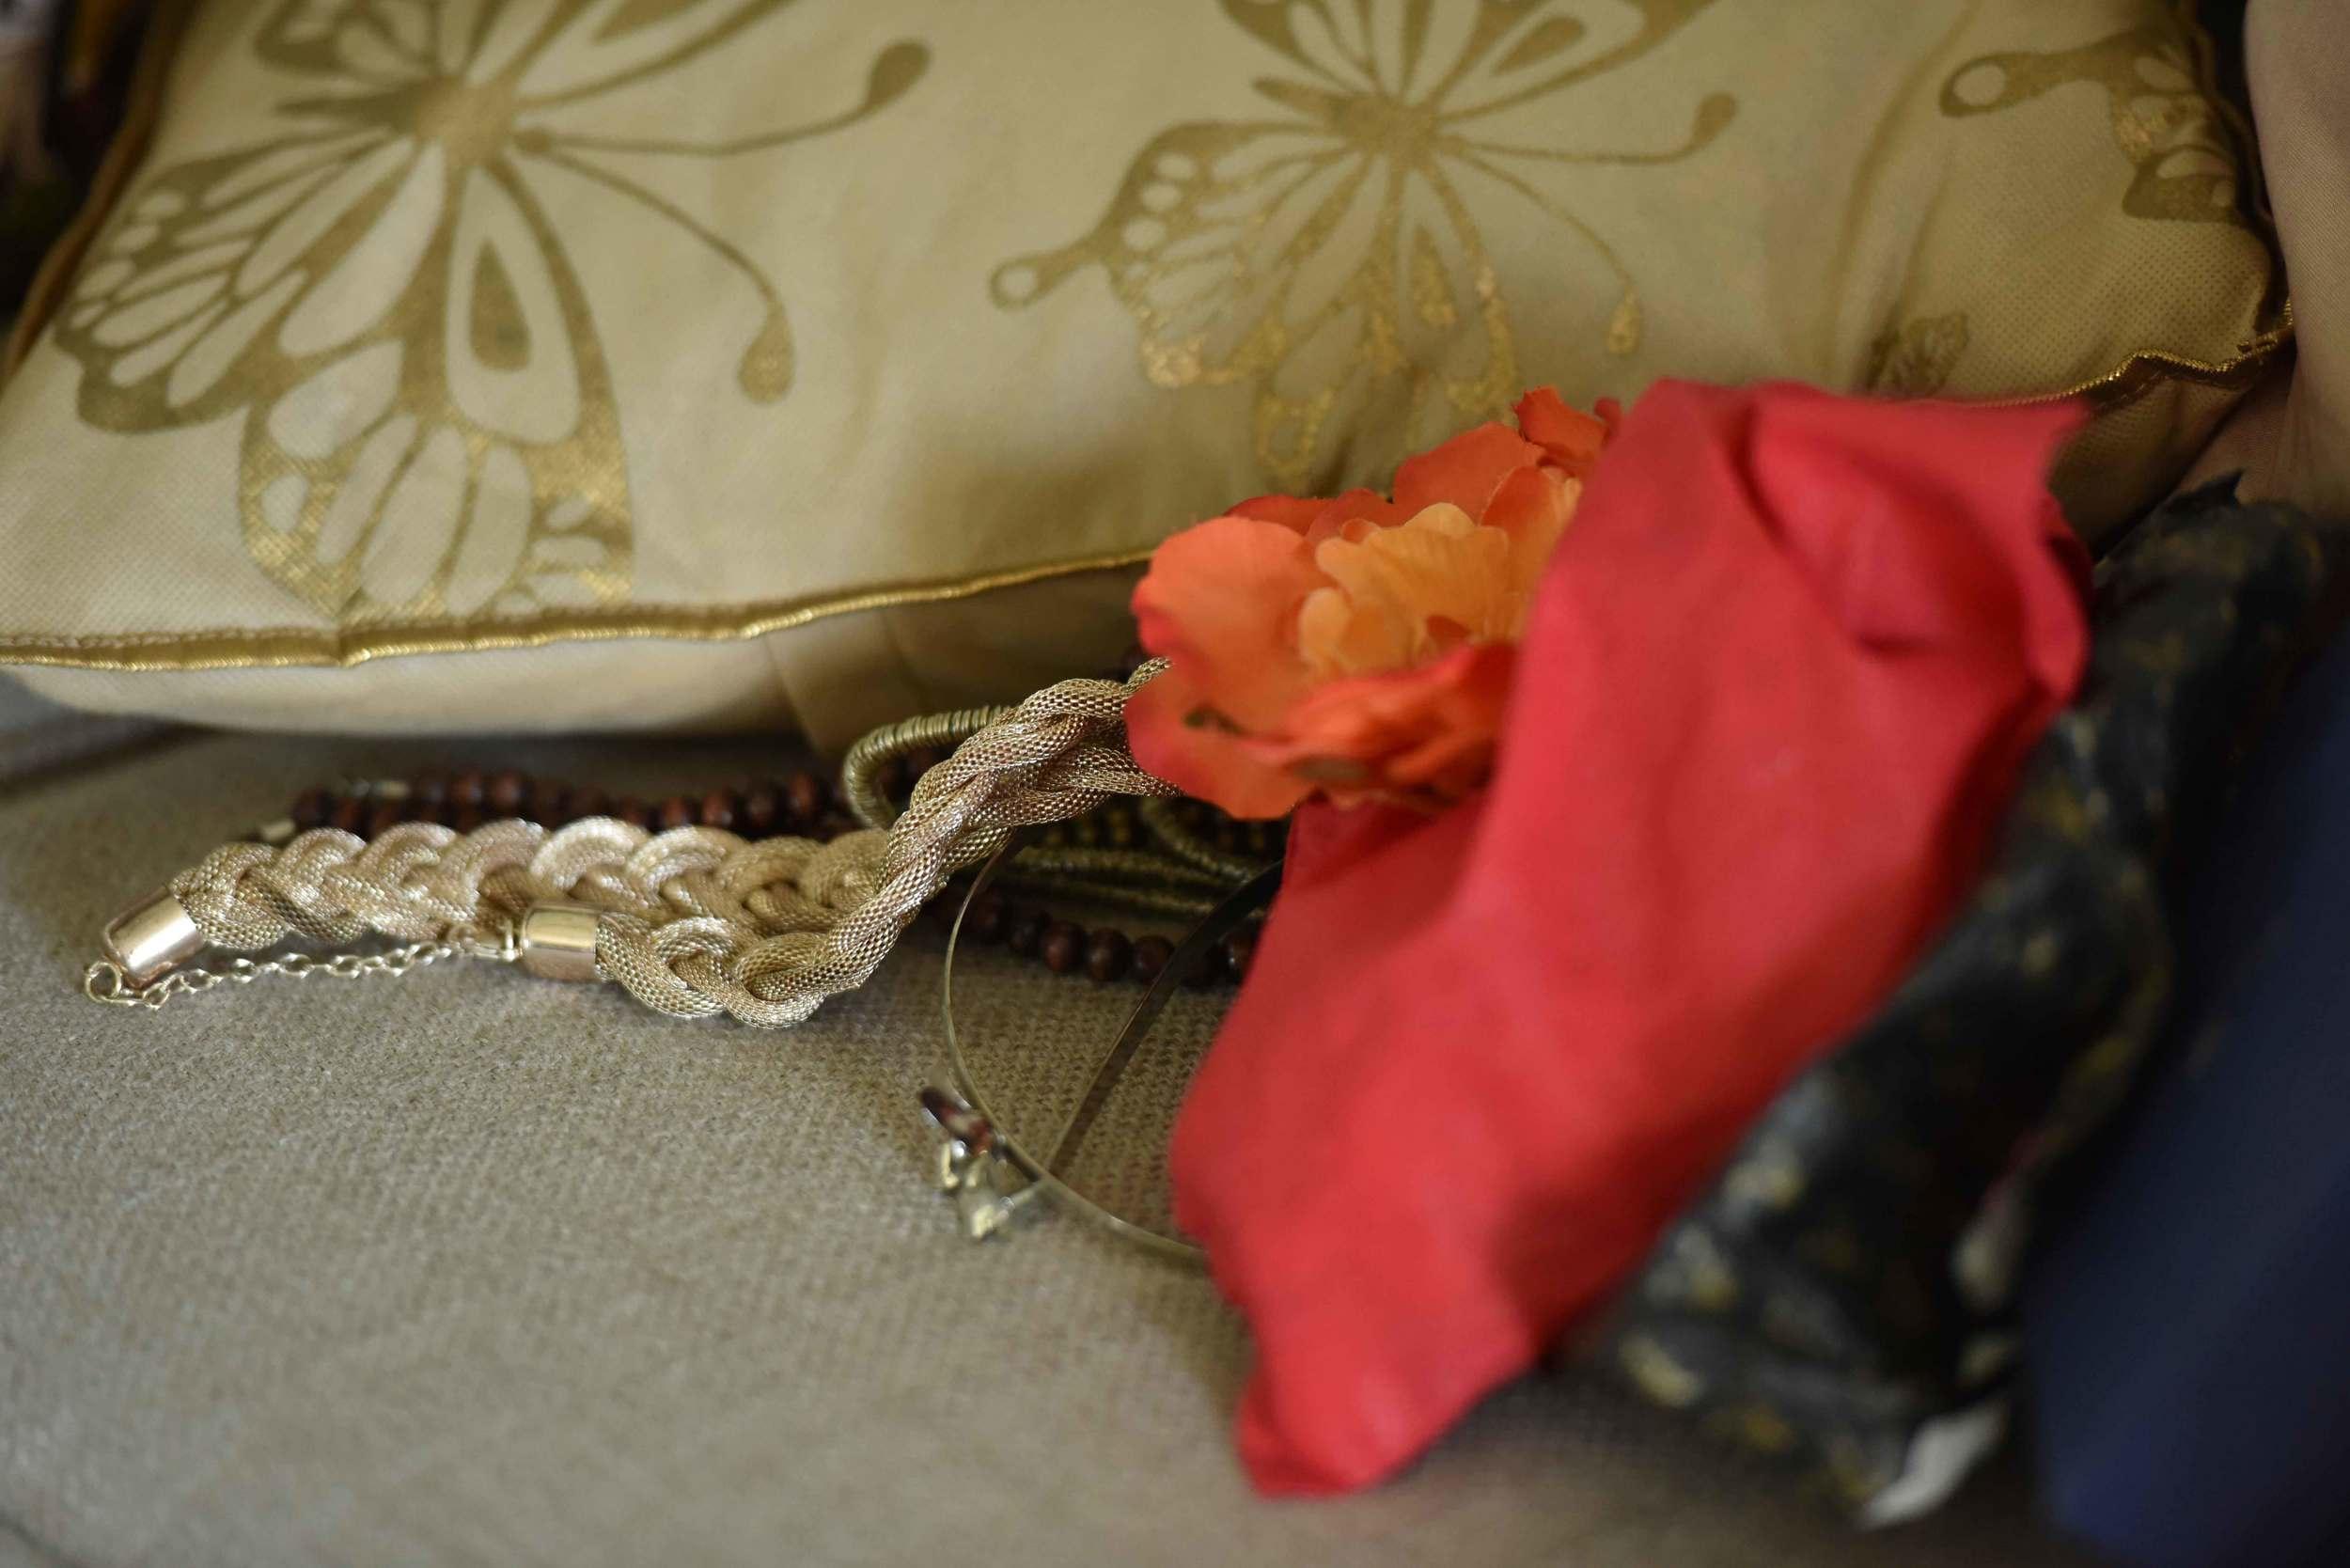 Store away your expensive jewelry! Image©gunjanvirk